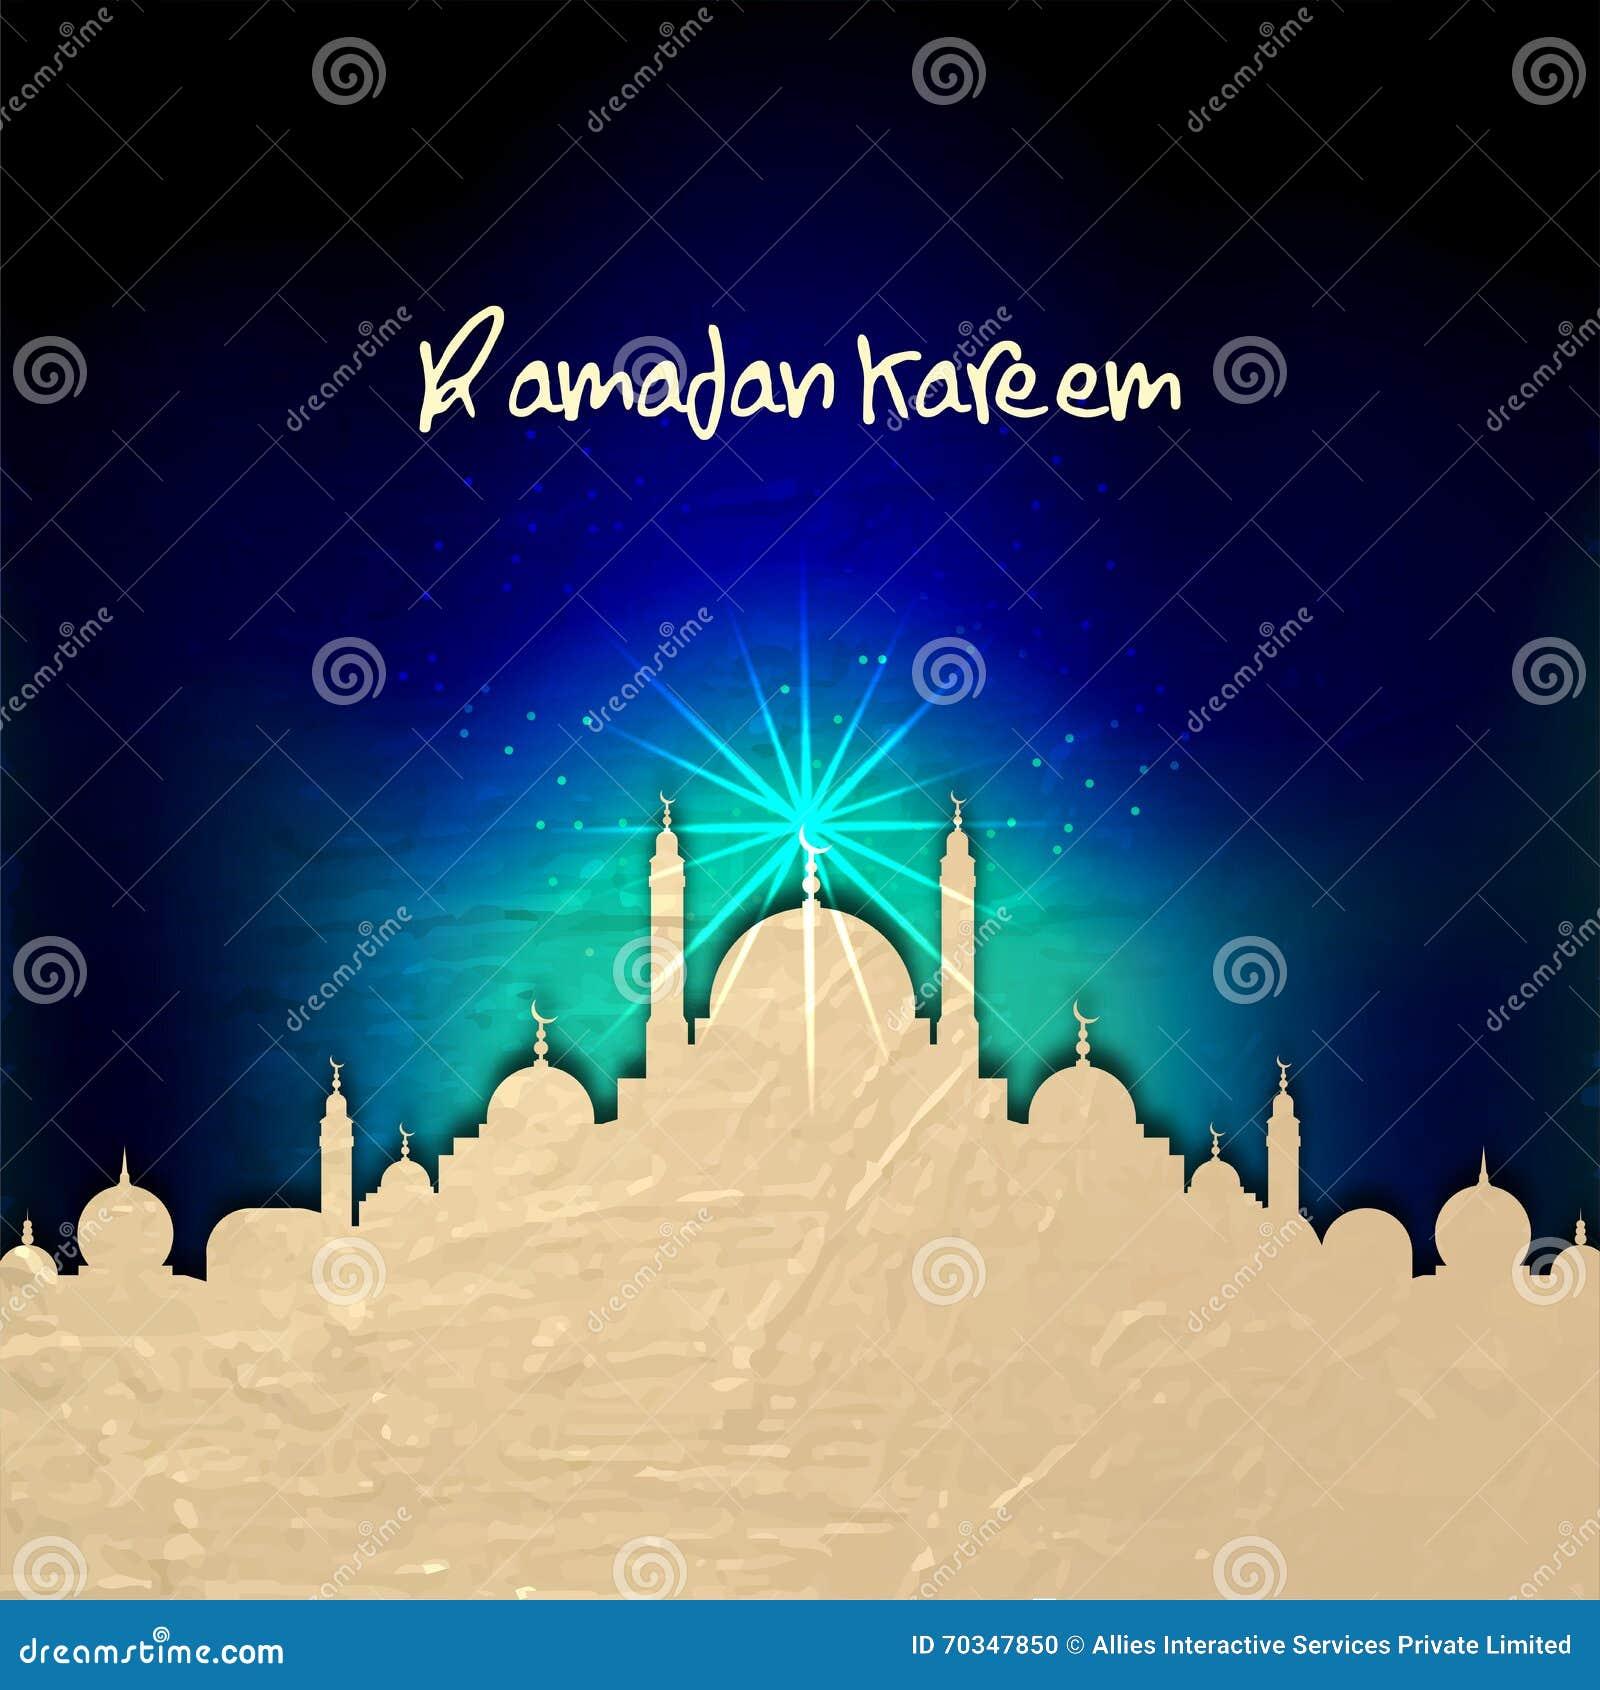 Mosque background for ramadan kareem stock photography image - Creative Mosque For Ramadan Kareem Stock Photo